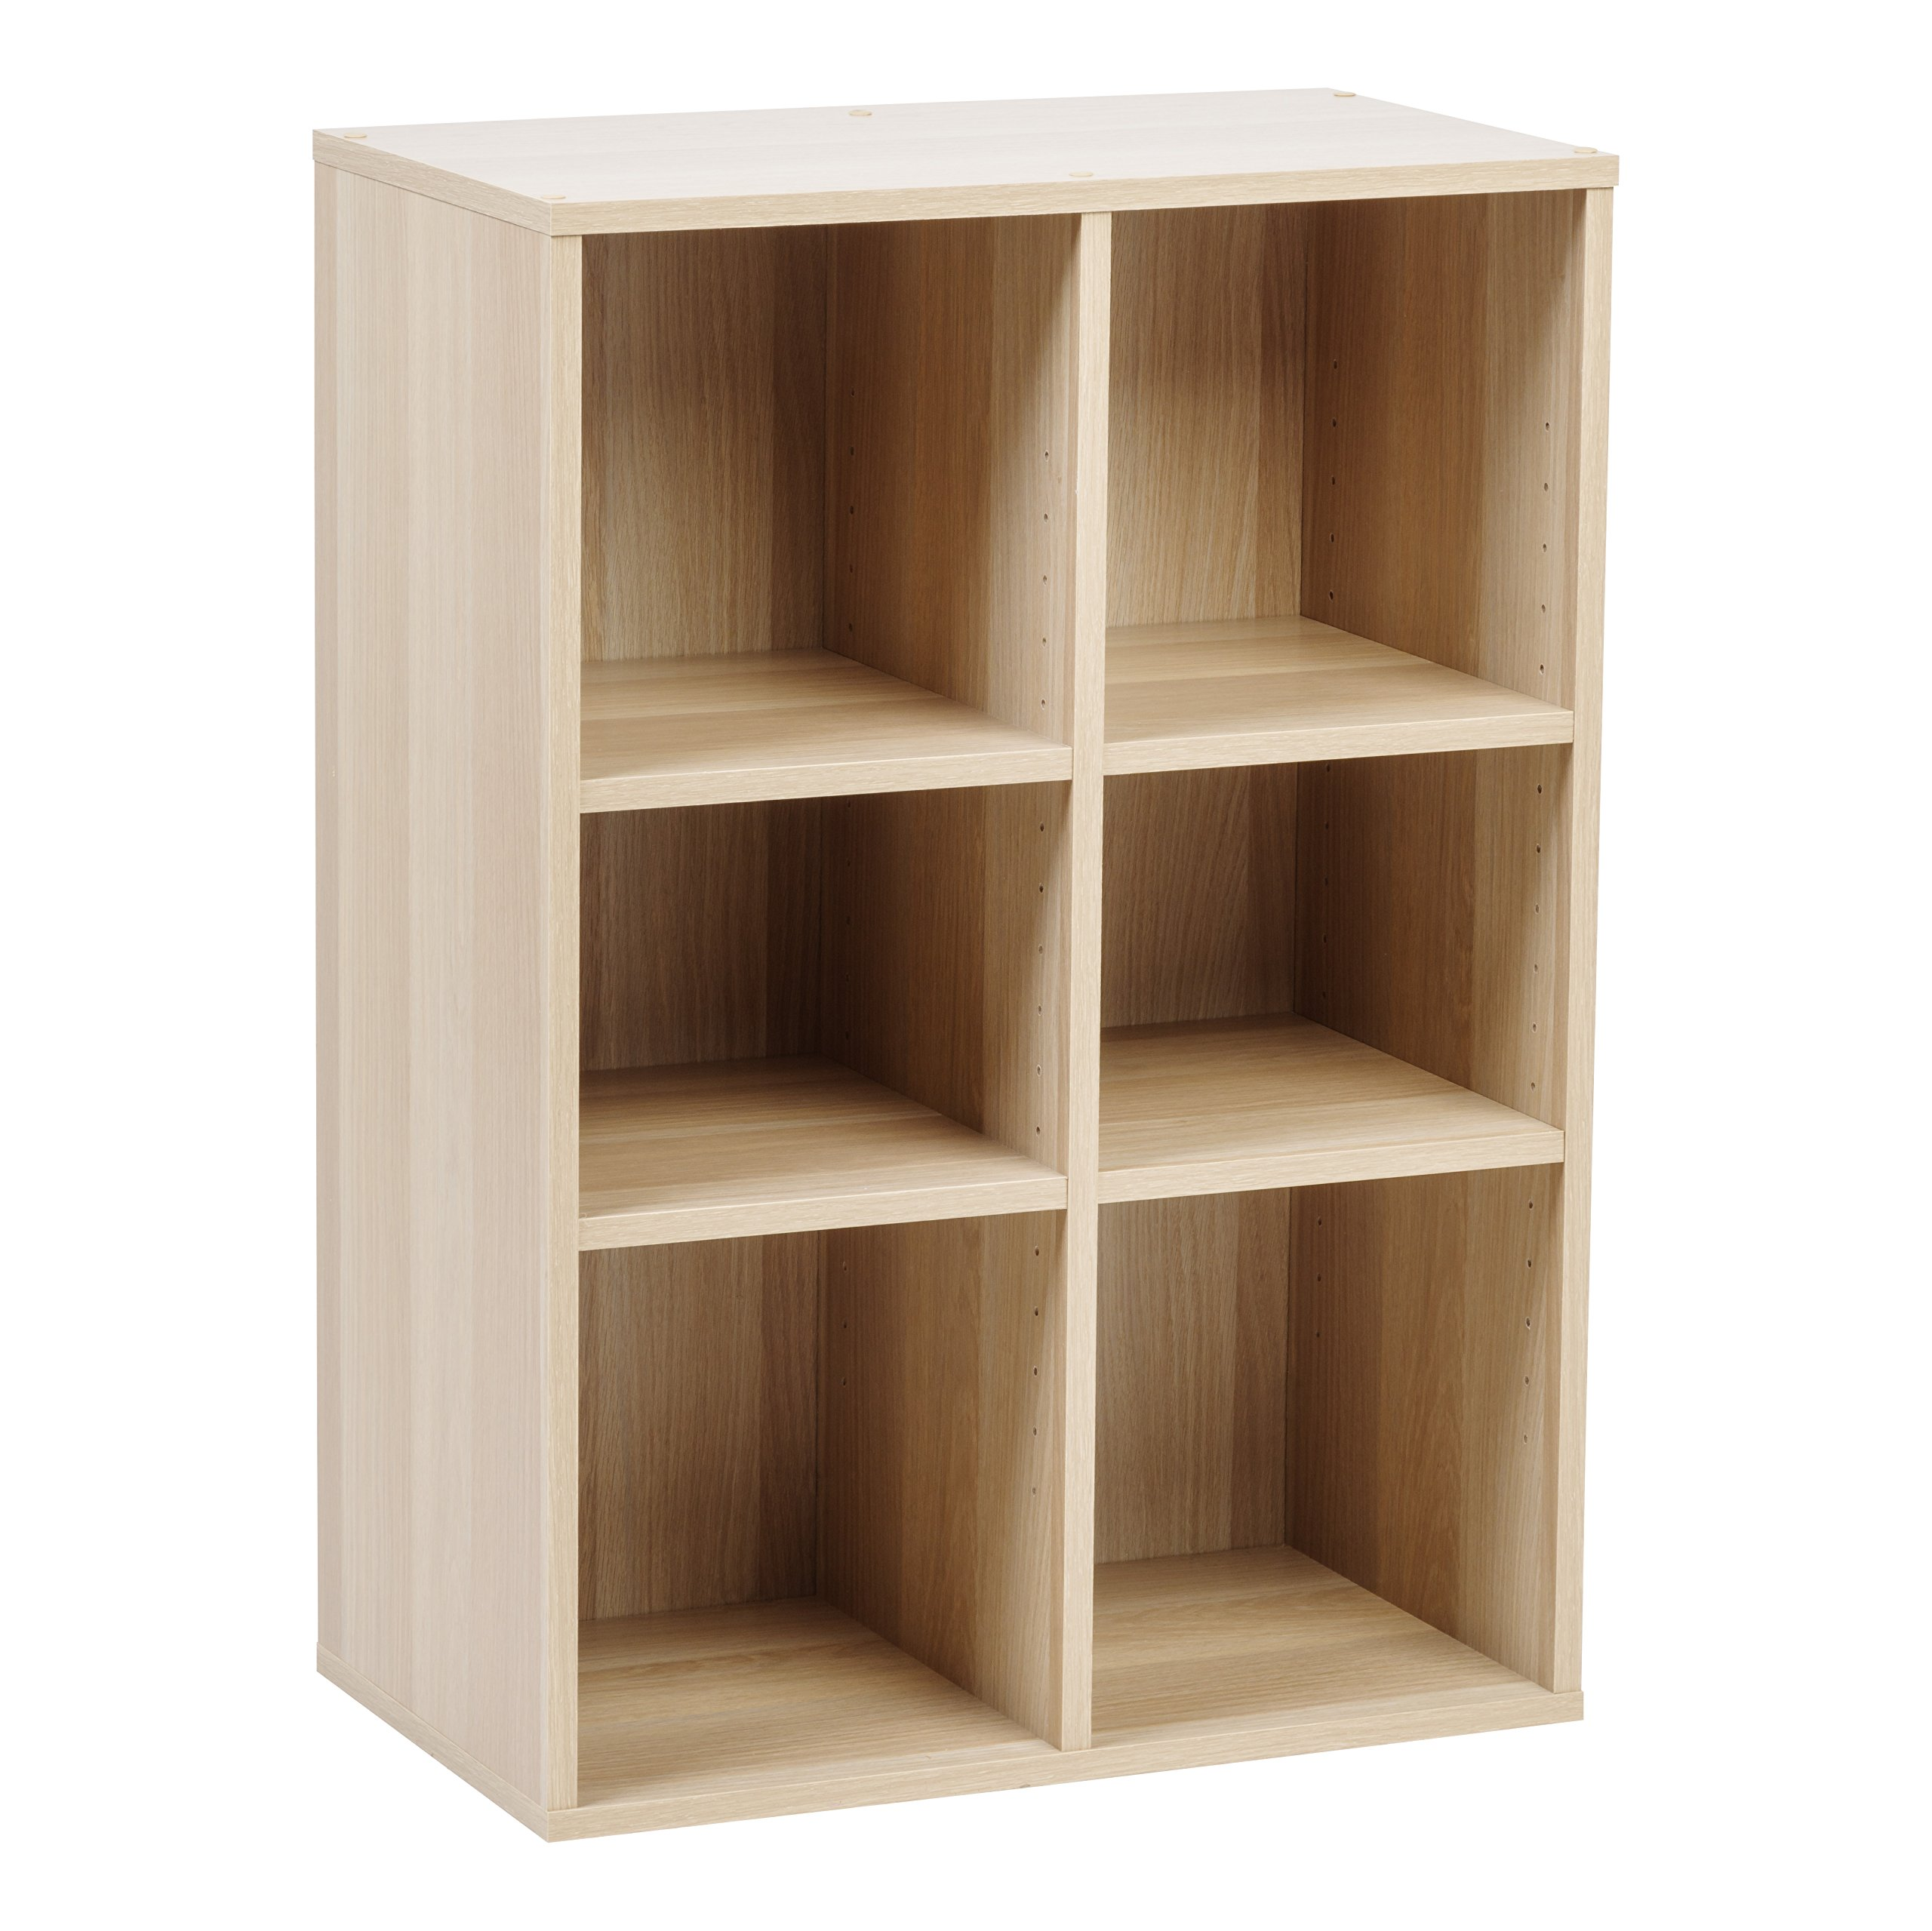 IRIS USA, Inc. 591857 Wood Shelf, 6-Compartment, Light Brown by IRIS USA, Inc.